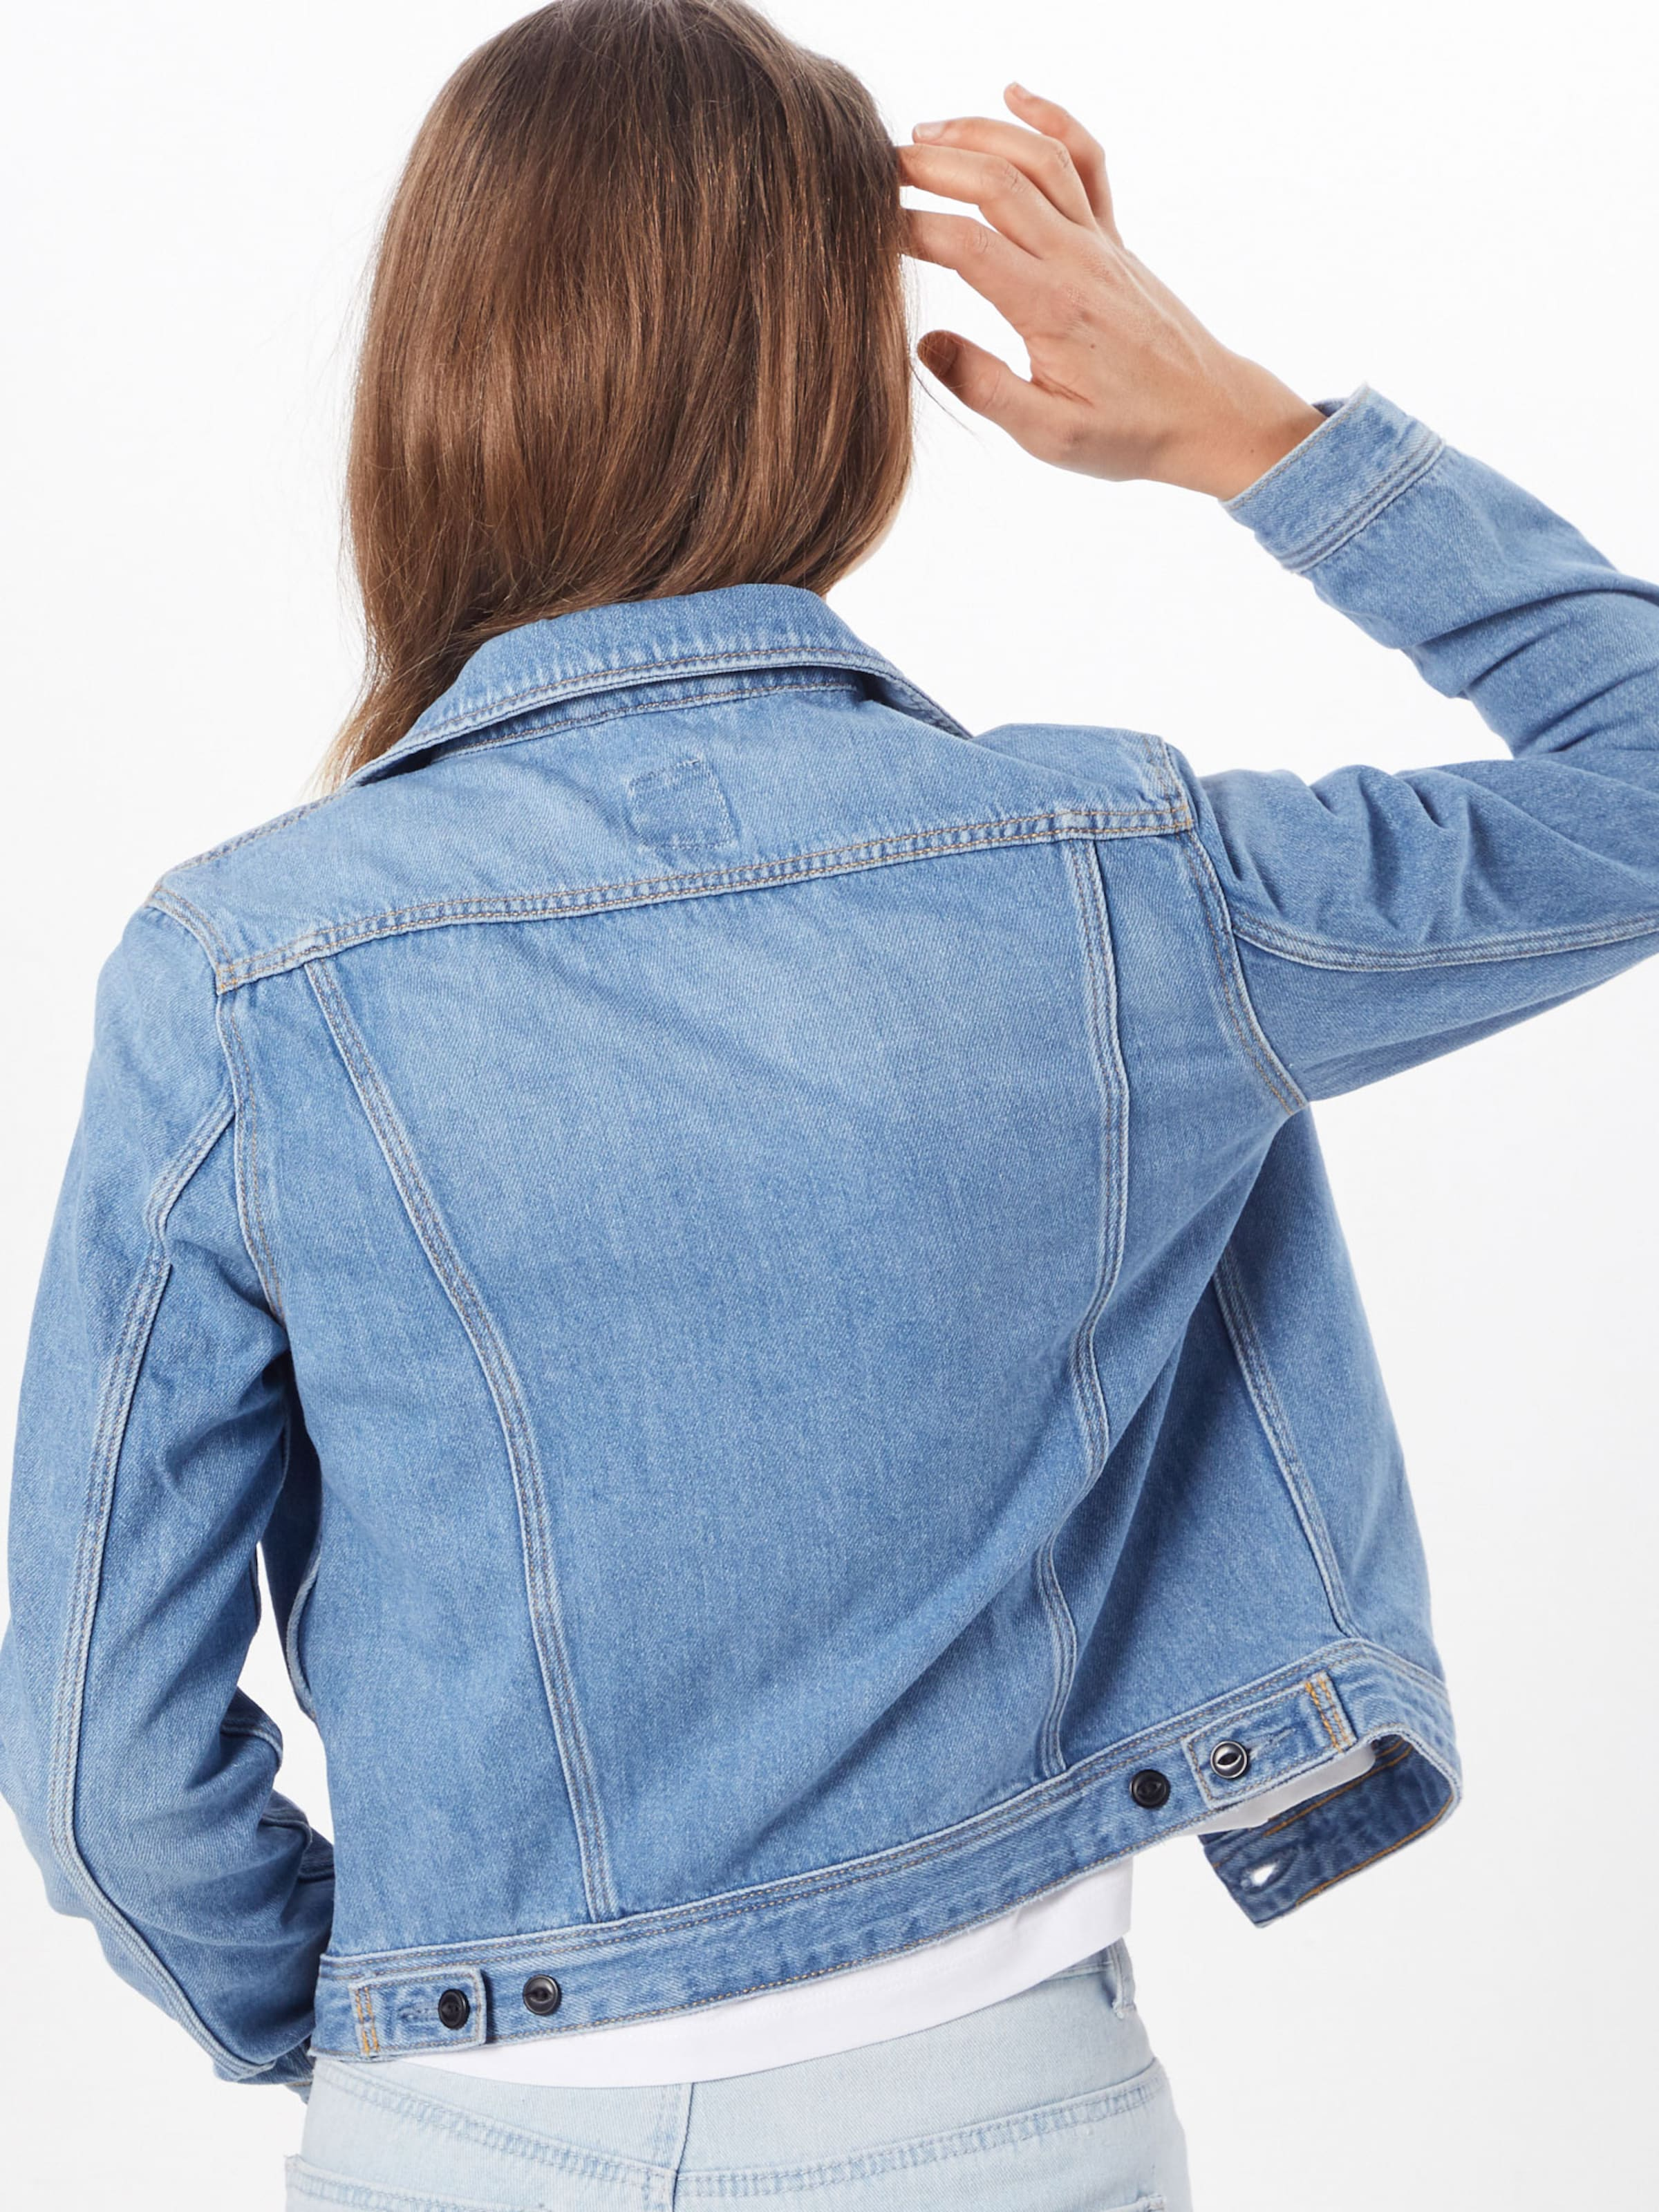 Veste Jacket' Denim Mi Bleu Lee En saison 'rider I7gyvmYf6b